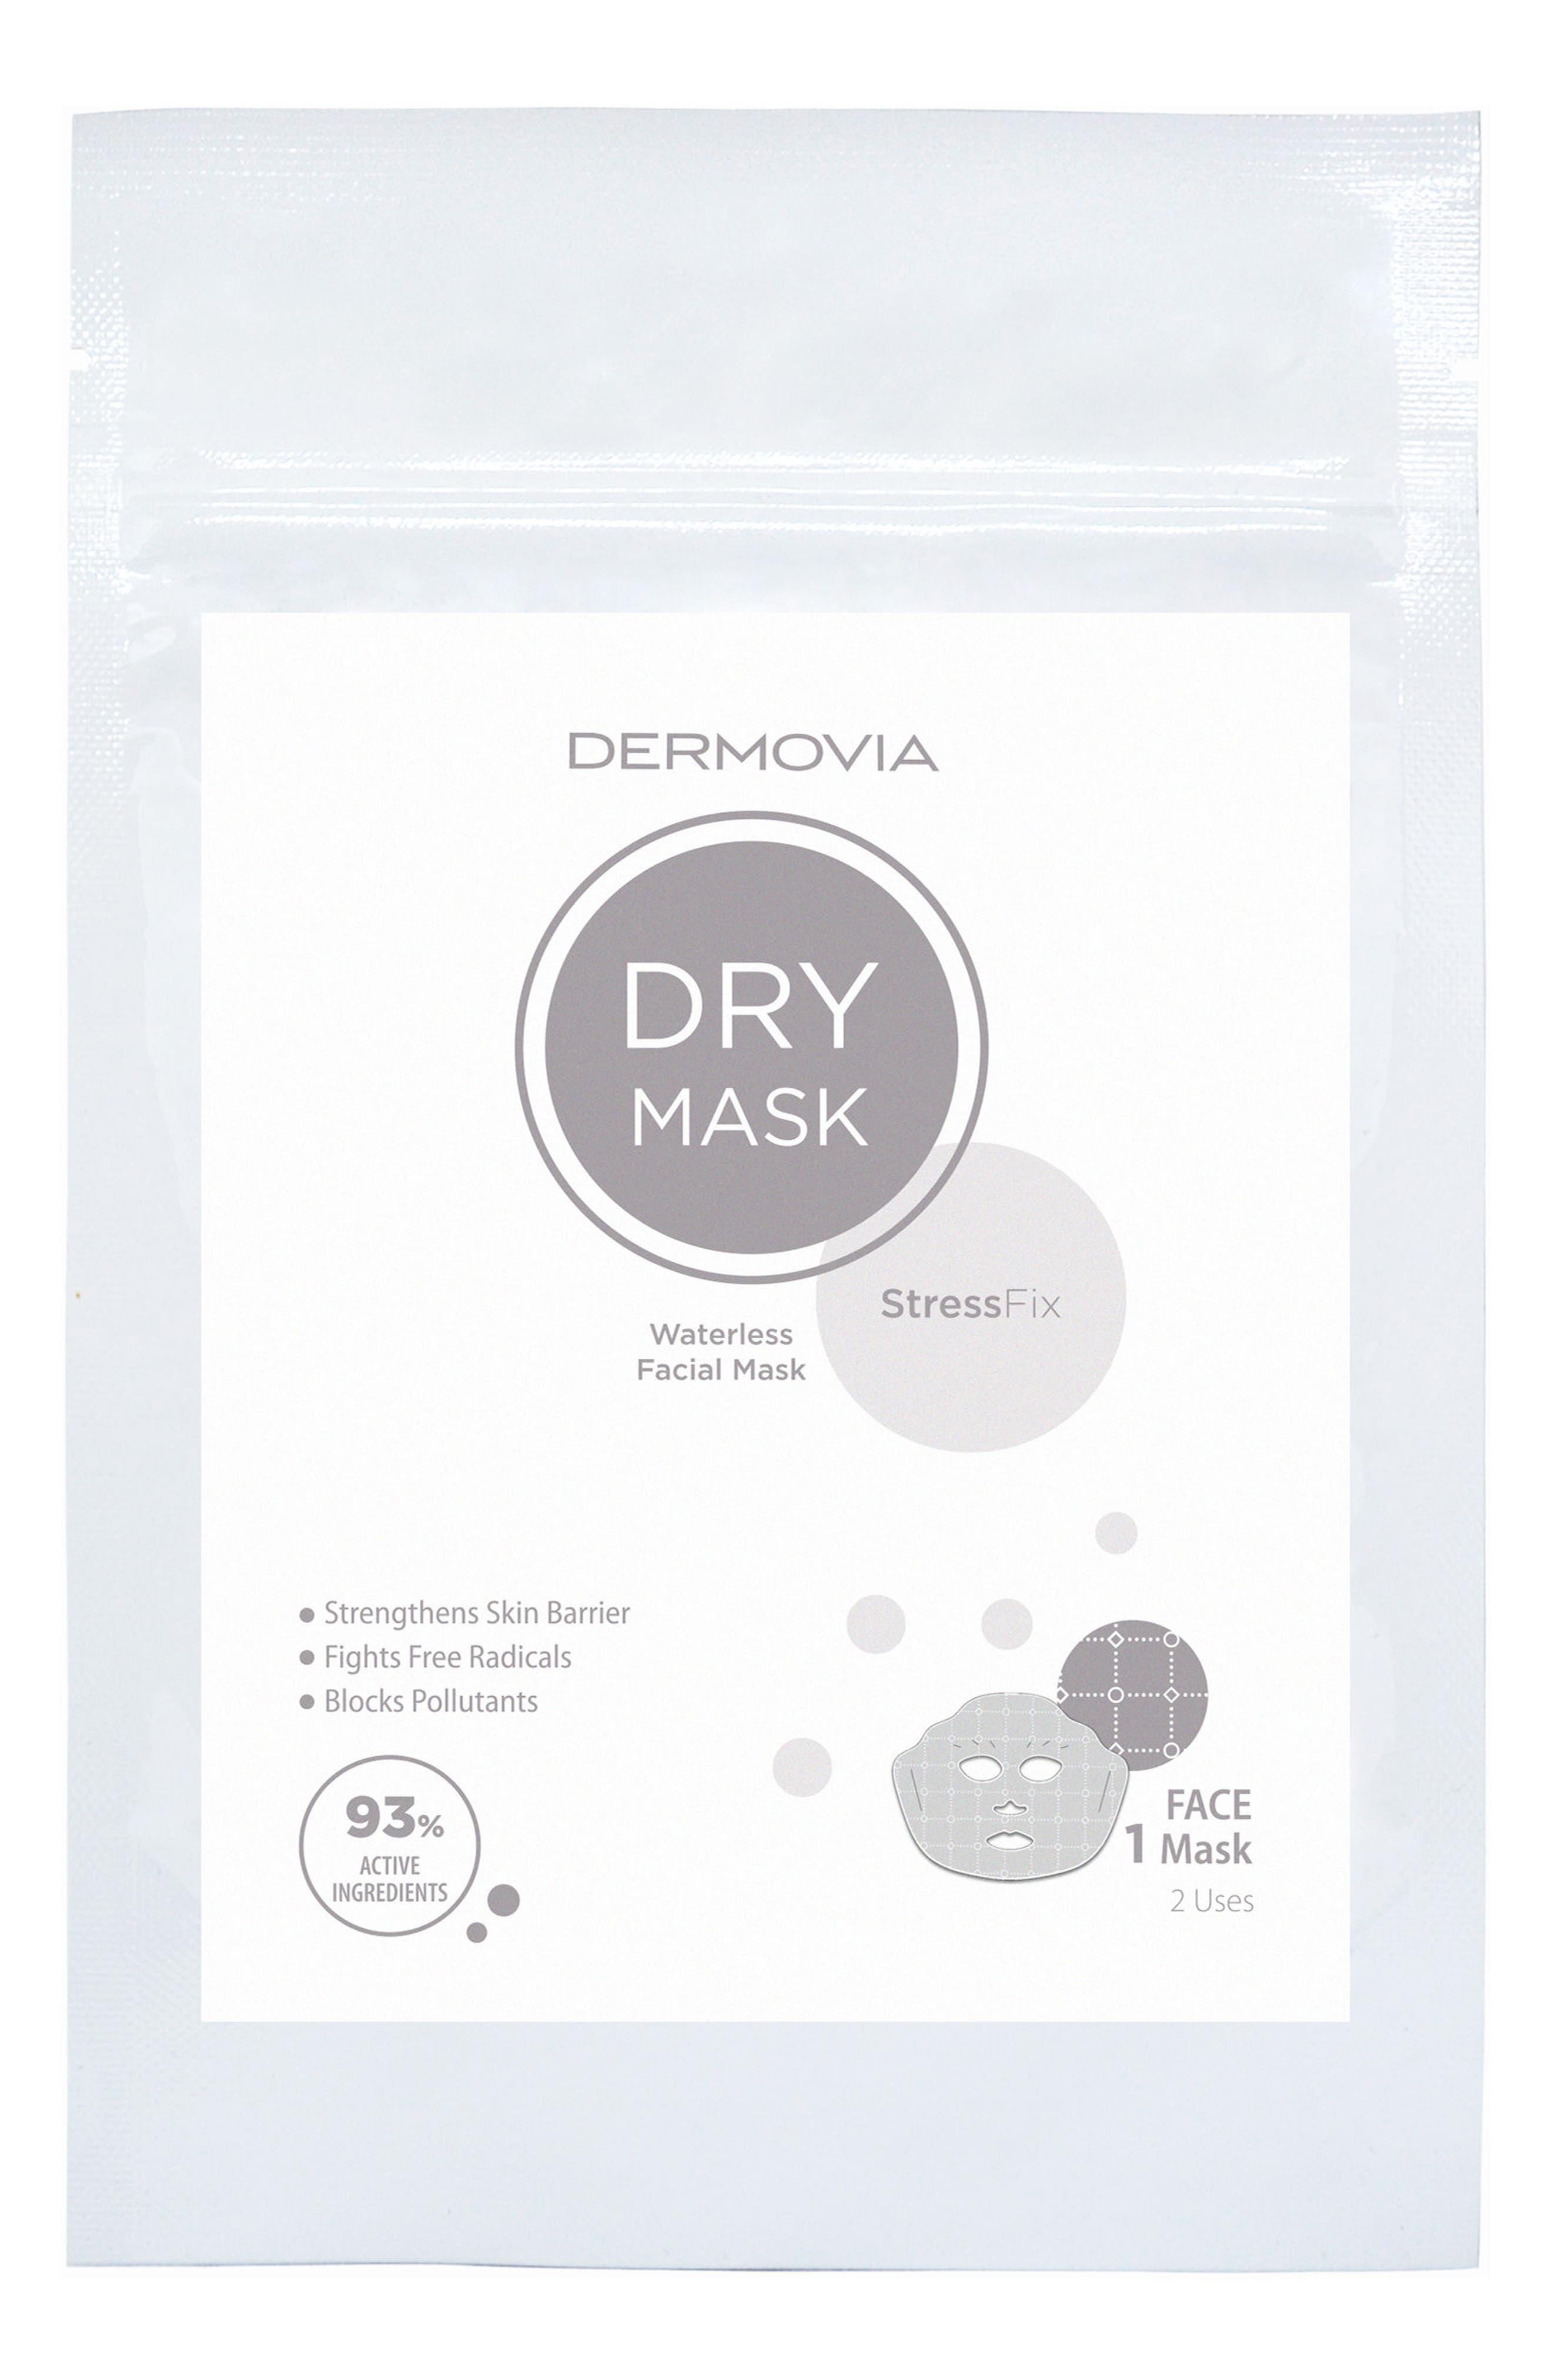 Dermovia DRY Mask StressFix Waterless Facial Mask